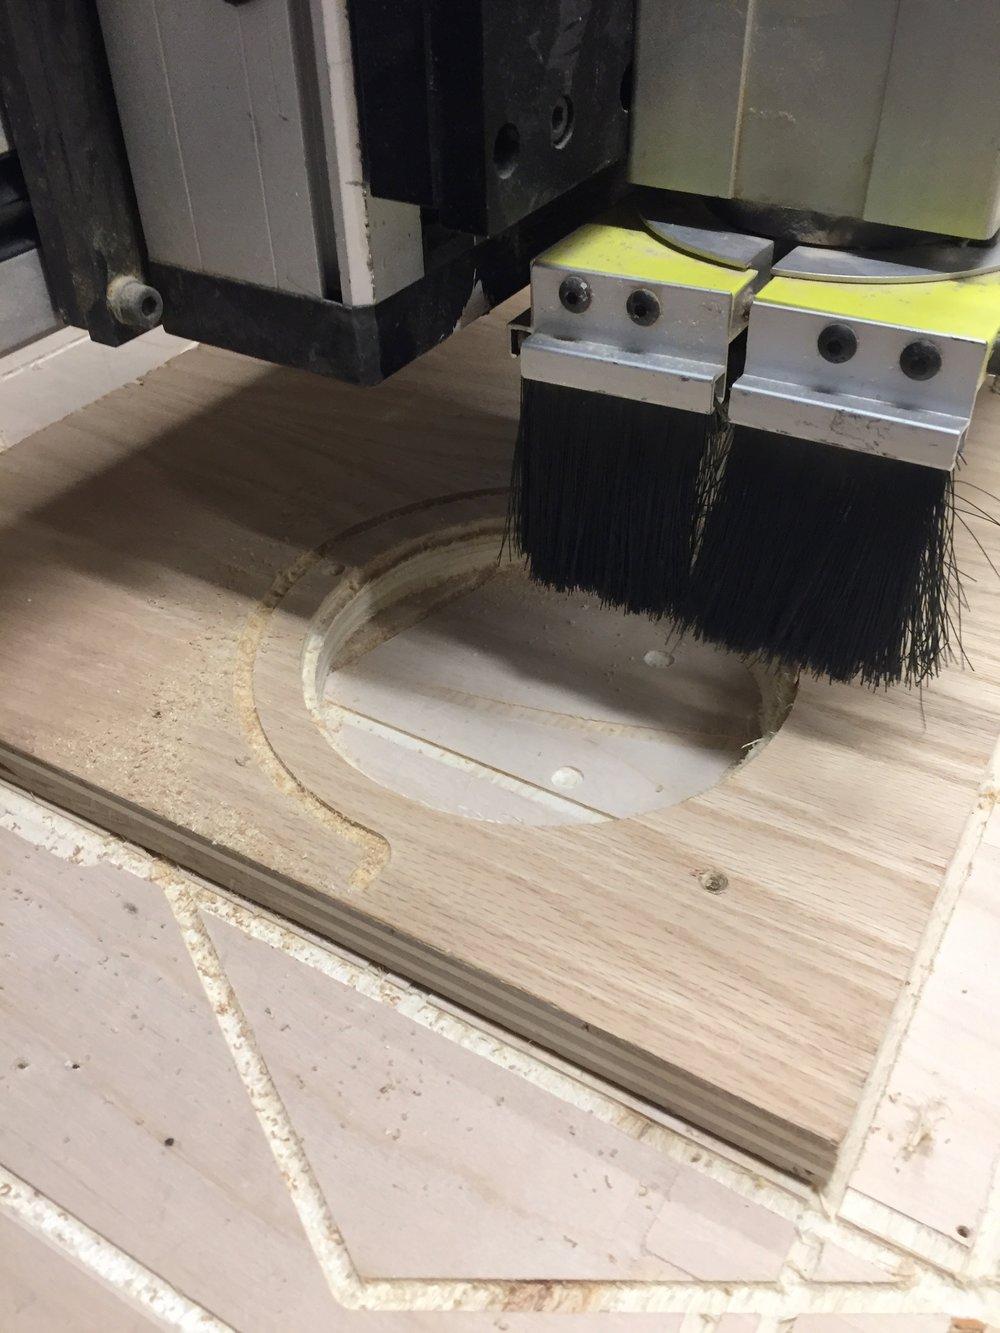 Cutting contours